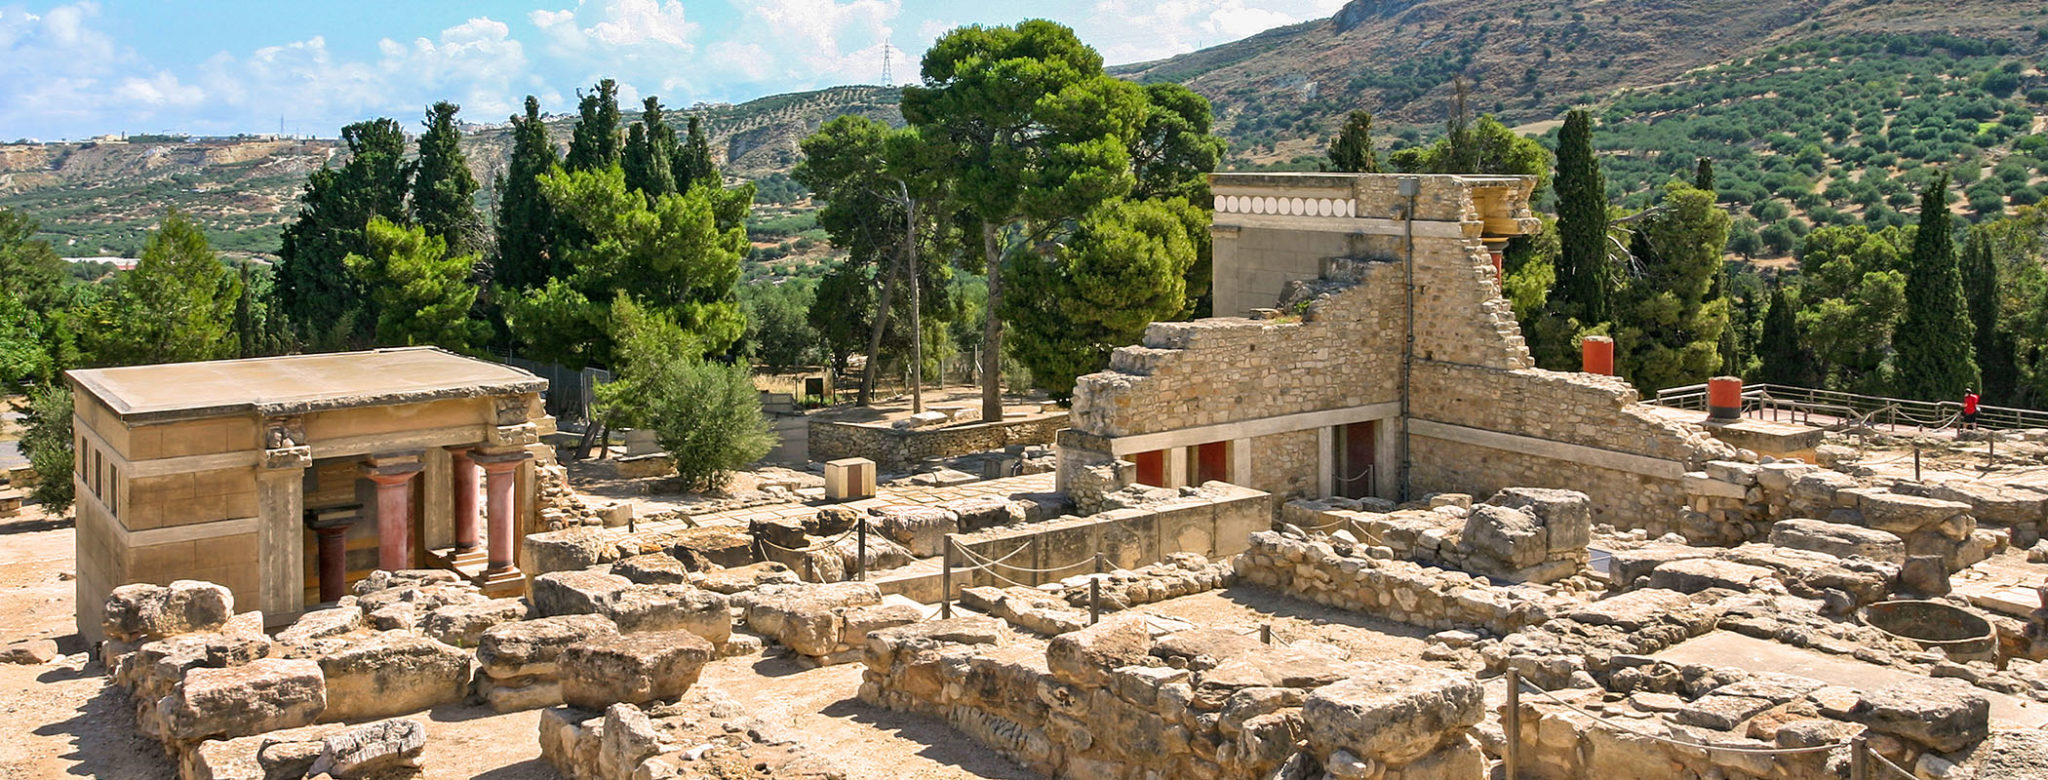 Bronzezeit auf KRETA: Europas erste Stadt bauten Minoer